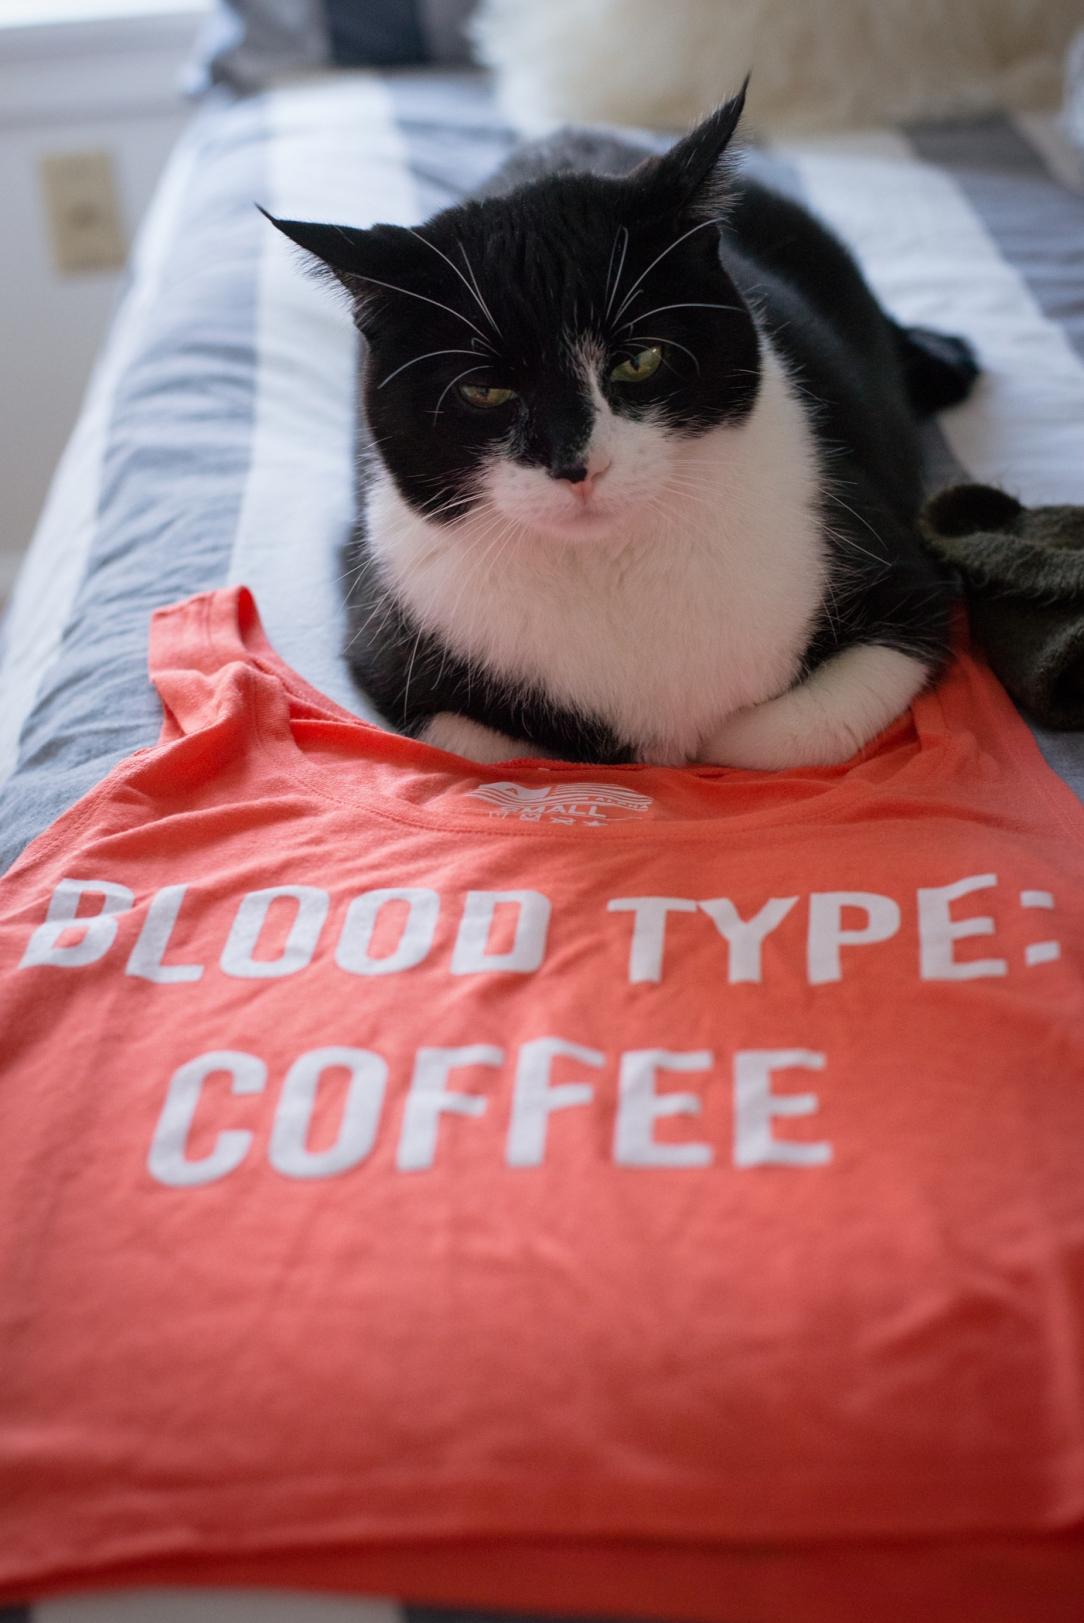 alpha-brew-coffee-jamie-bannon-photography_7288